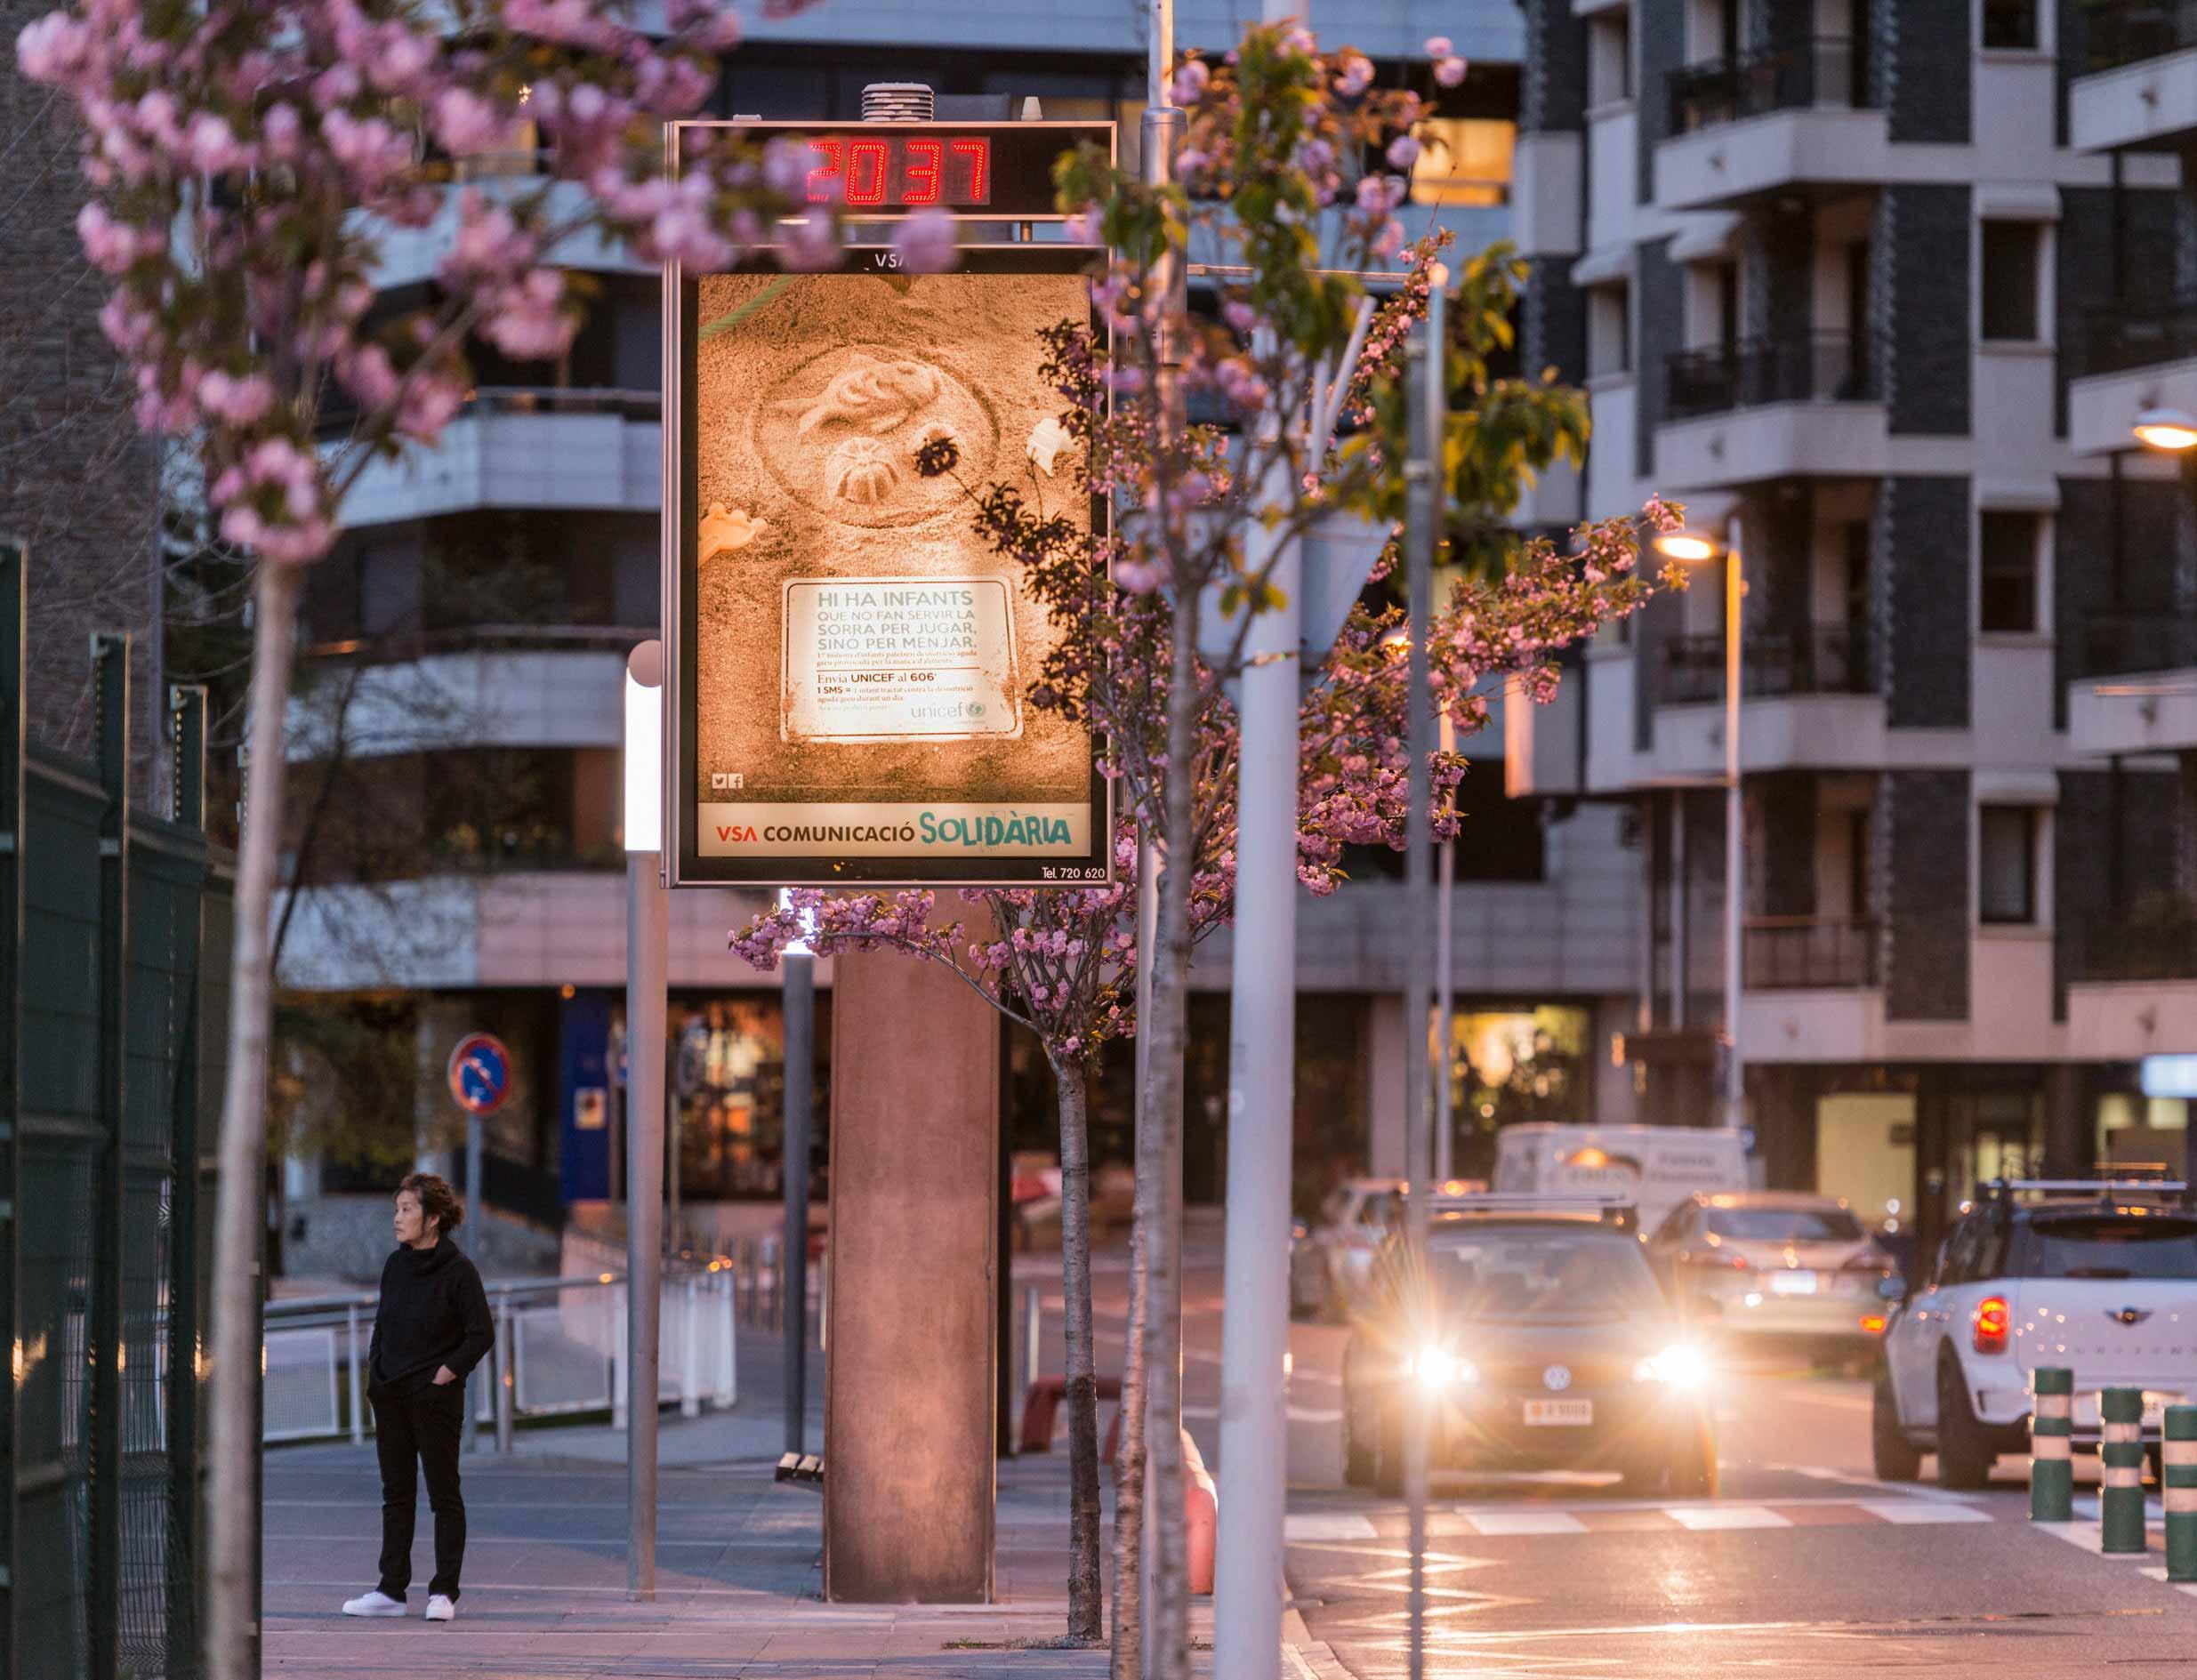 mobiliario-urbano-oppi-reloj-publicidad-exterior-unicef-andorra-rsc-vsa-comunicacion